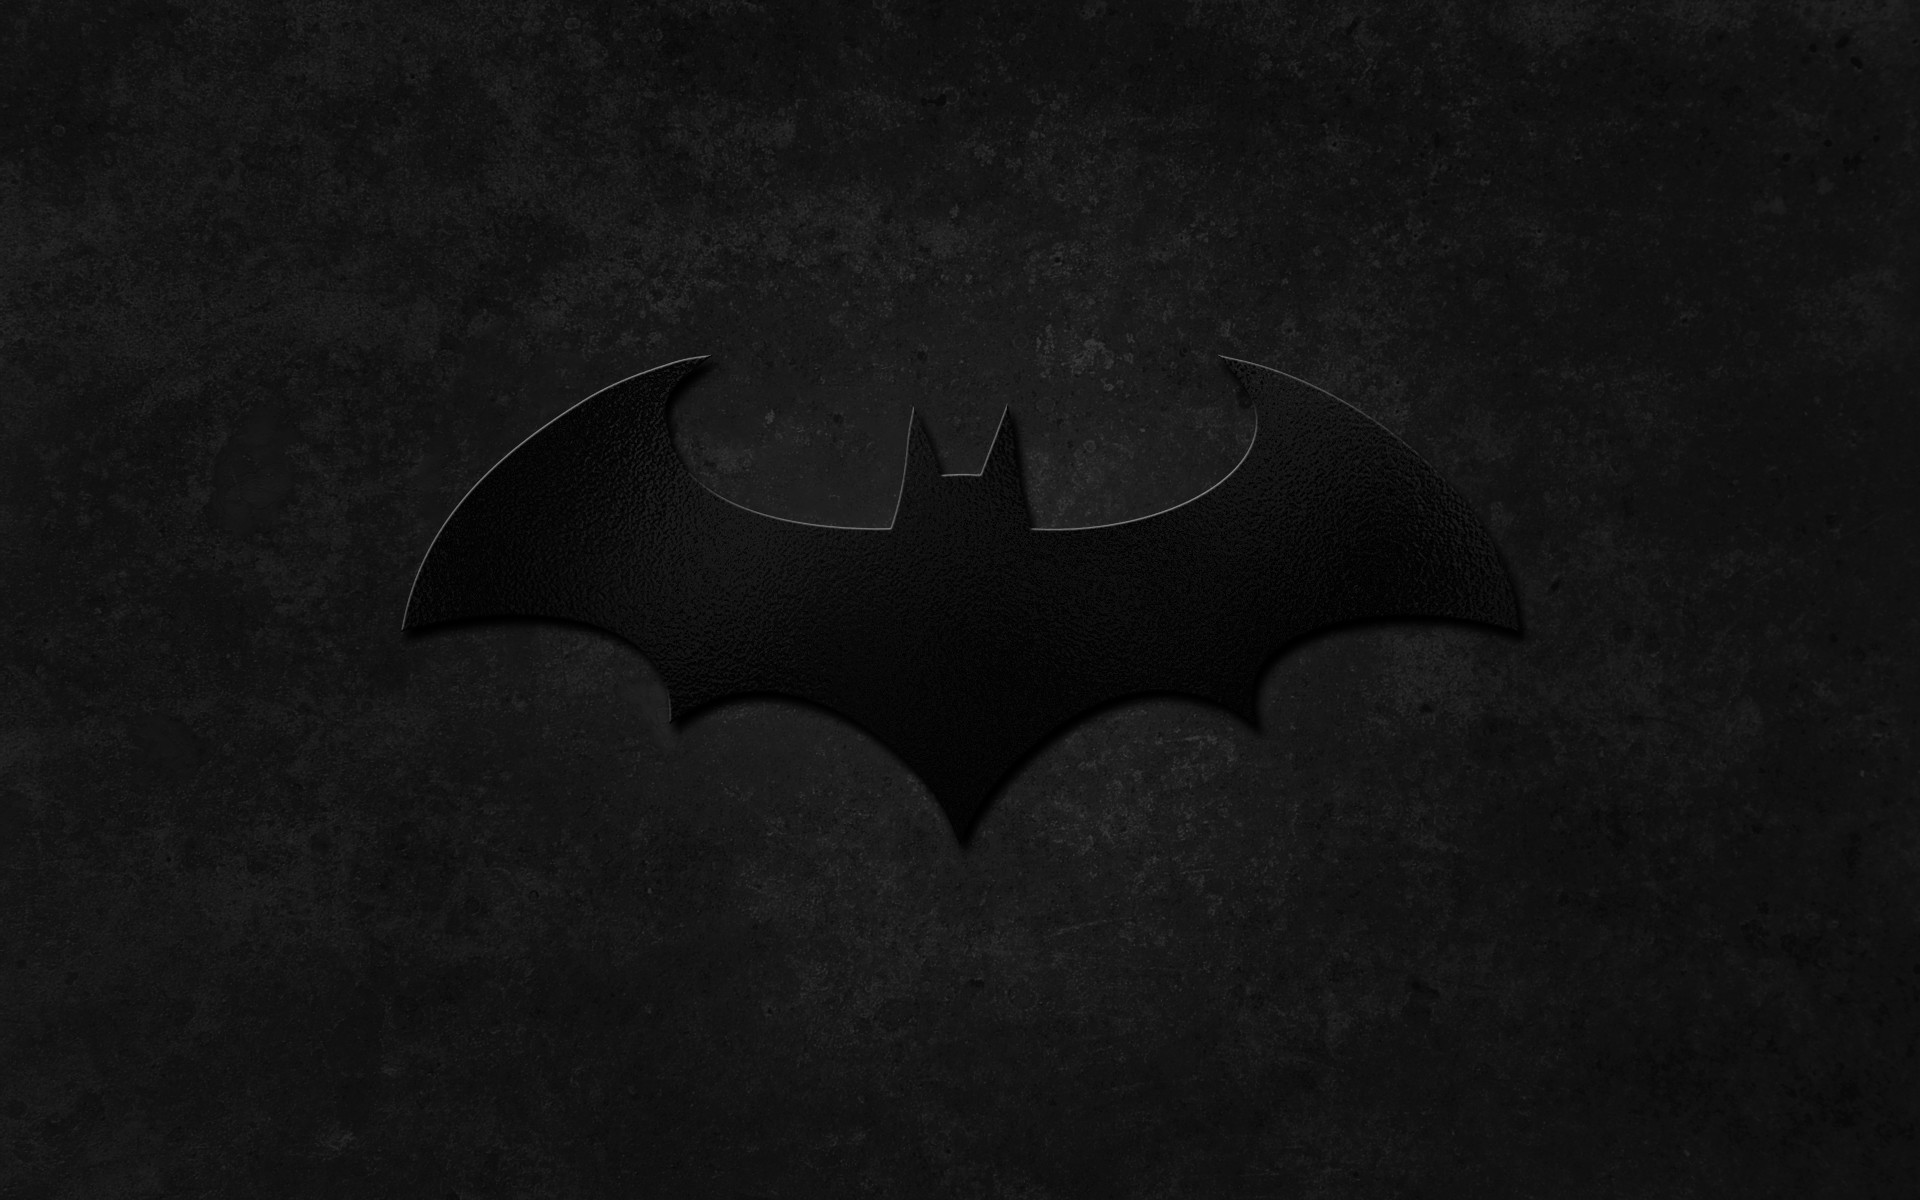 Batman Logo wallpapers For Free Download HD p   HD Wallpapers   Pinterest    Wallpaper, Logos and Hd wallpaper